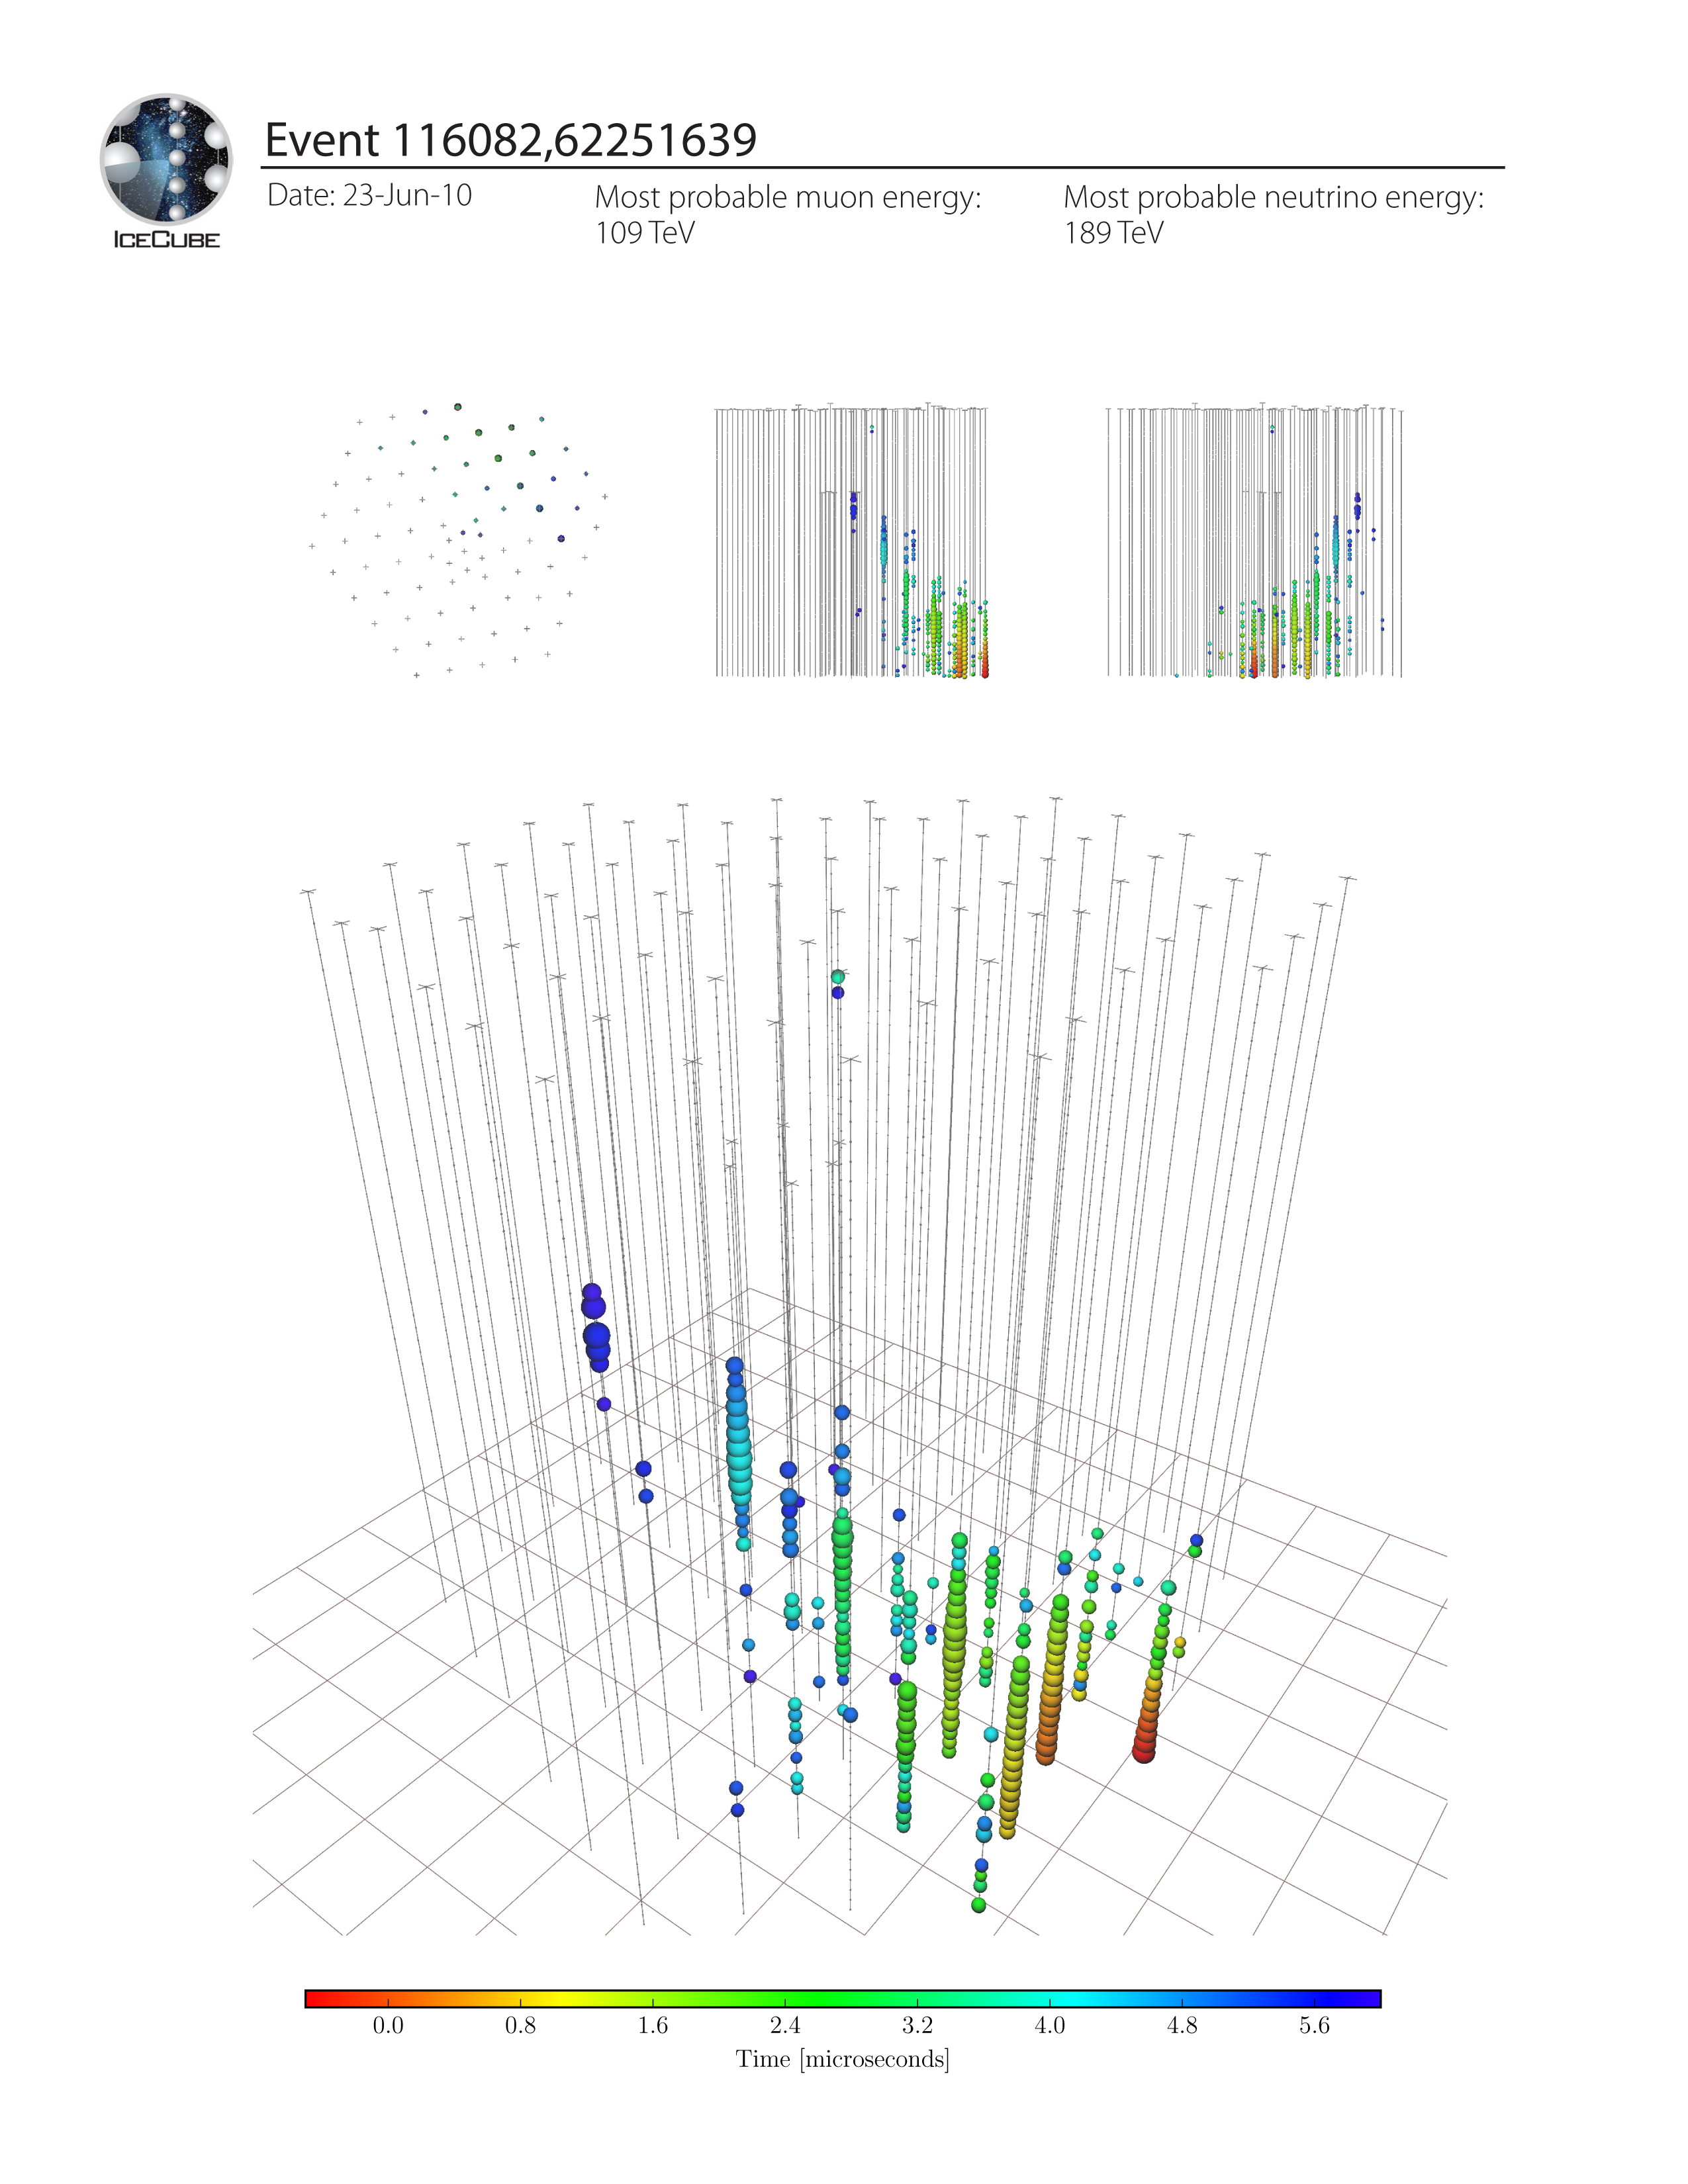 IceCube Event ID 116082,62251639. Most probable neutrino energy: 189 TeV, June 23, 2010